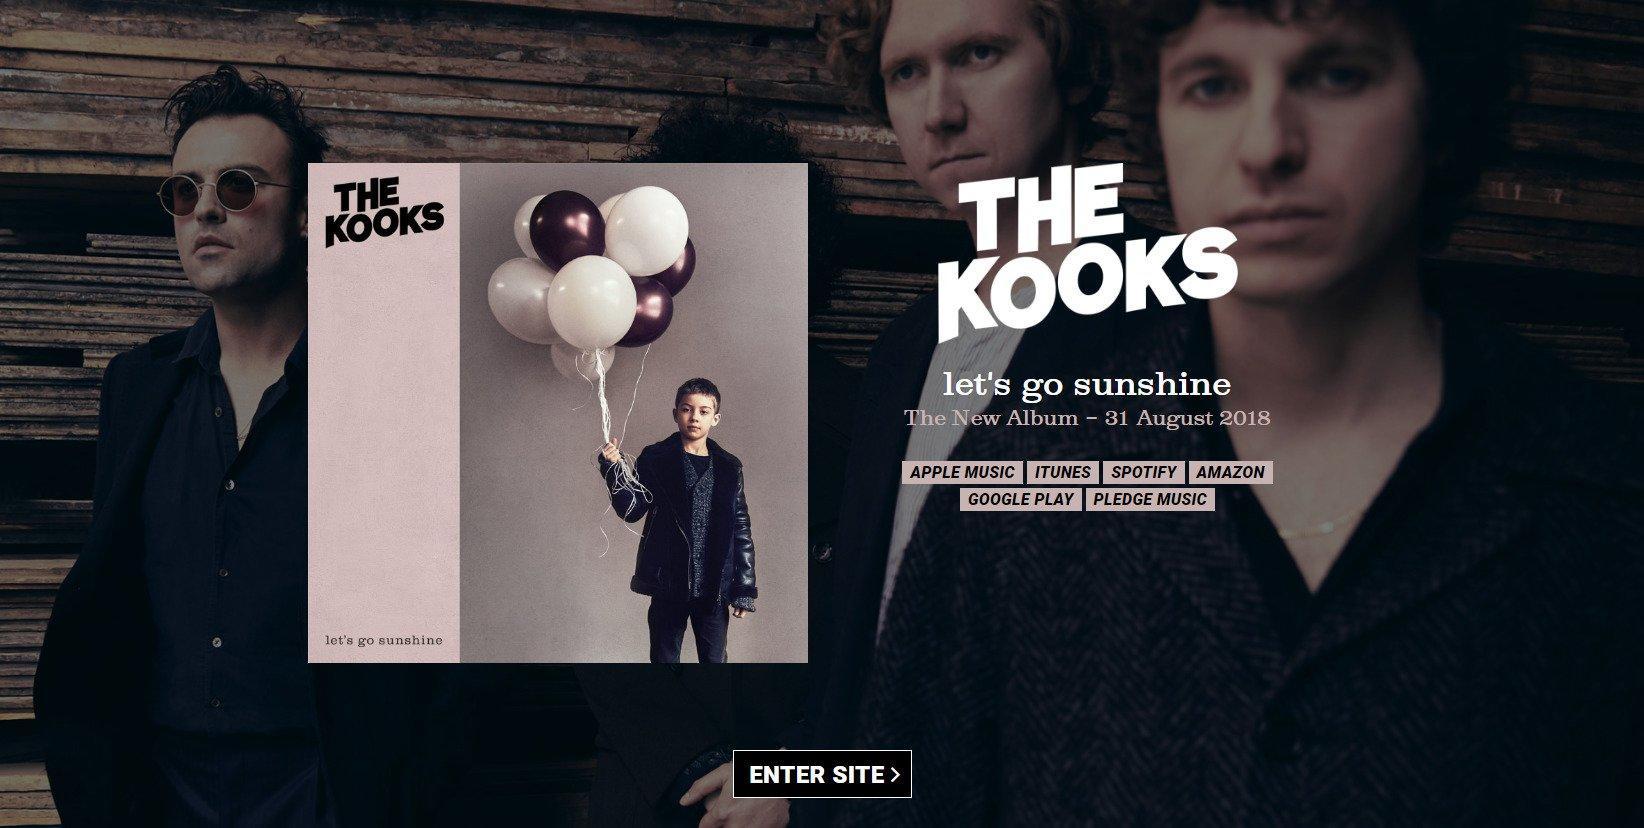 kooks-homepage-music-marketing-tips